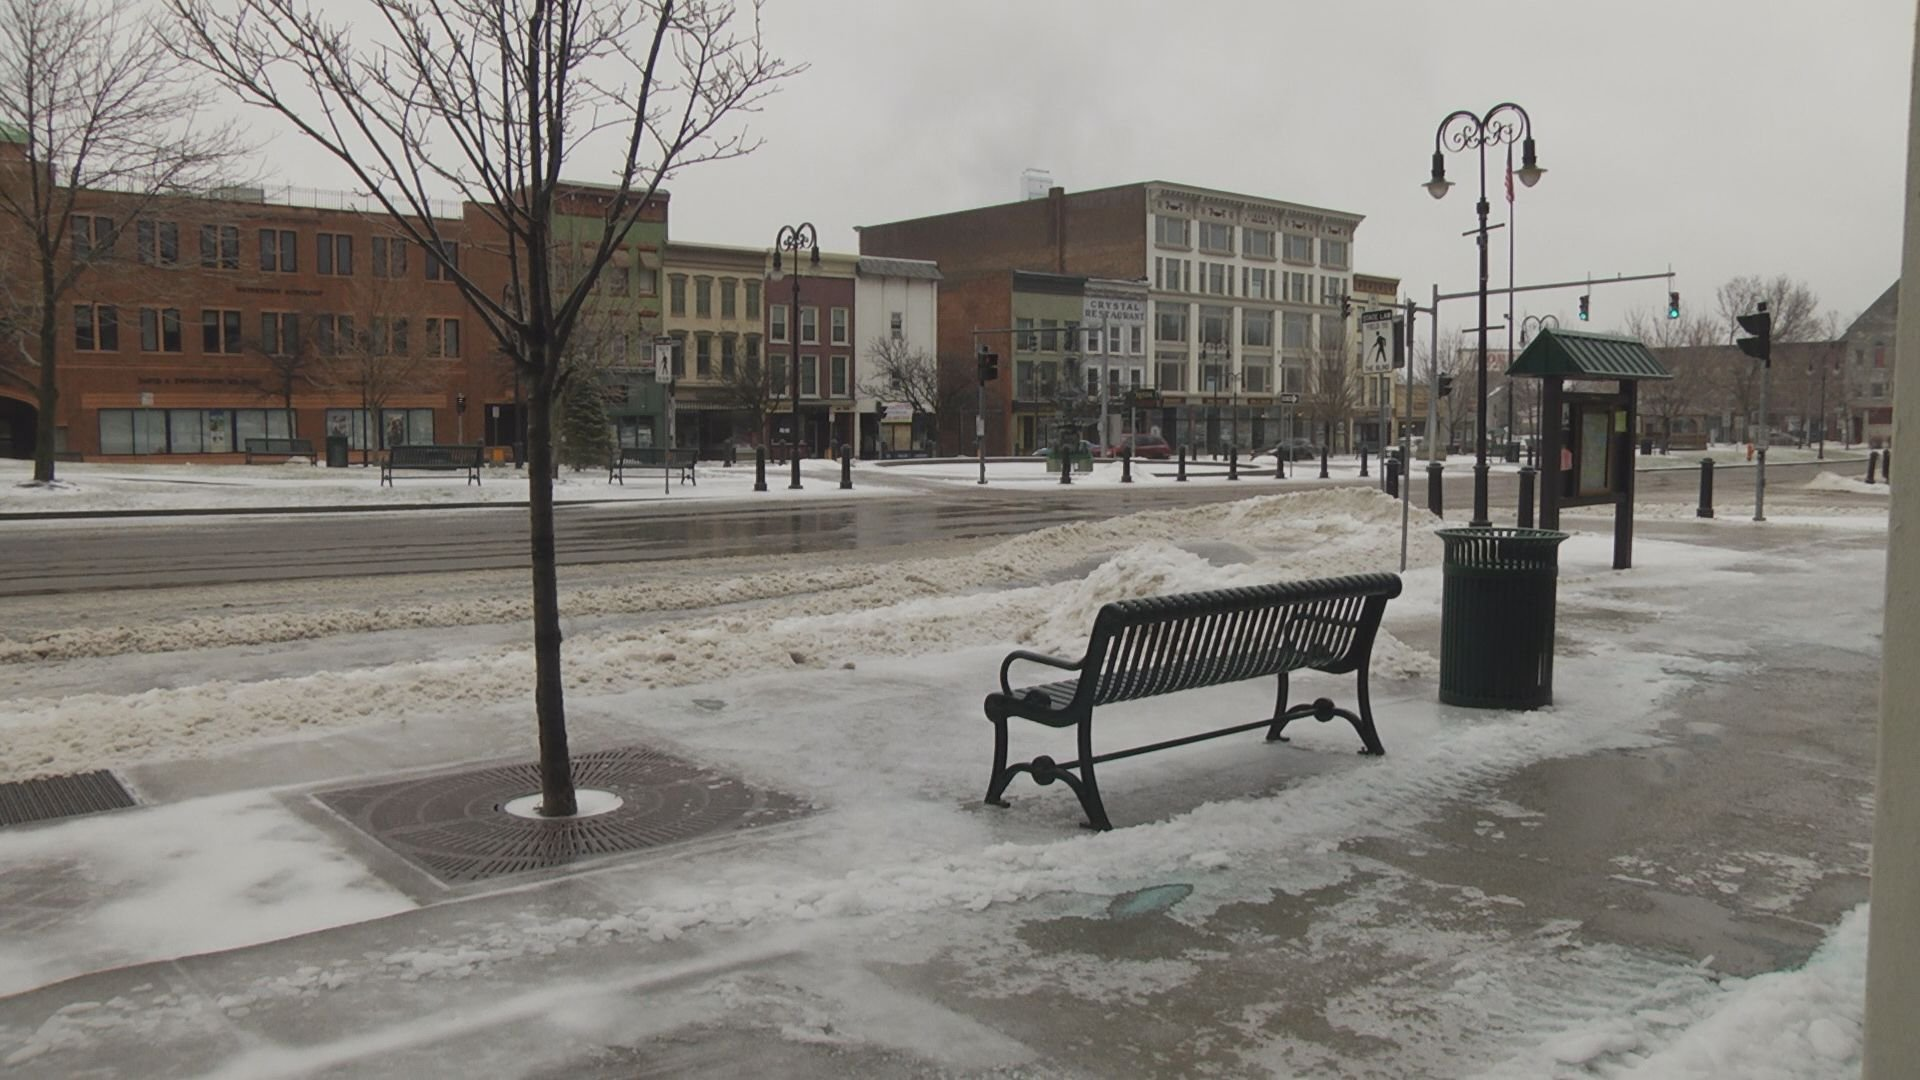 Public Square, Watertown, Sunday morning